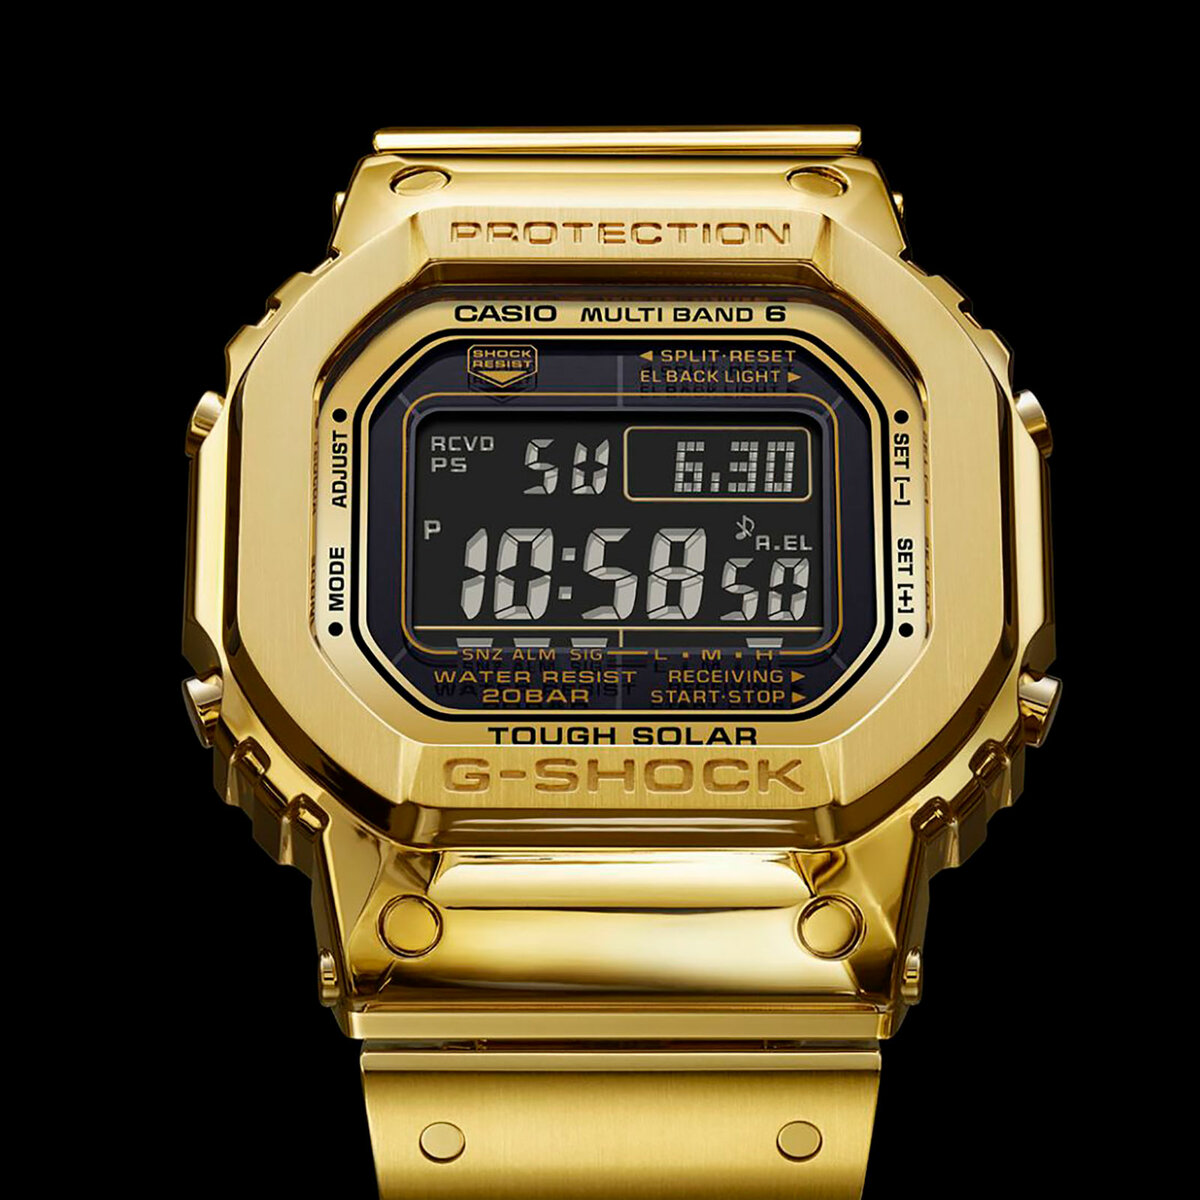 Pure_Gold_G-SHOCK_18k_G-D5000-9JR-1.